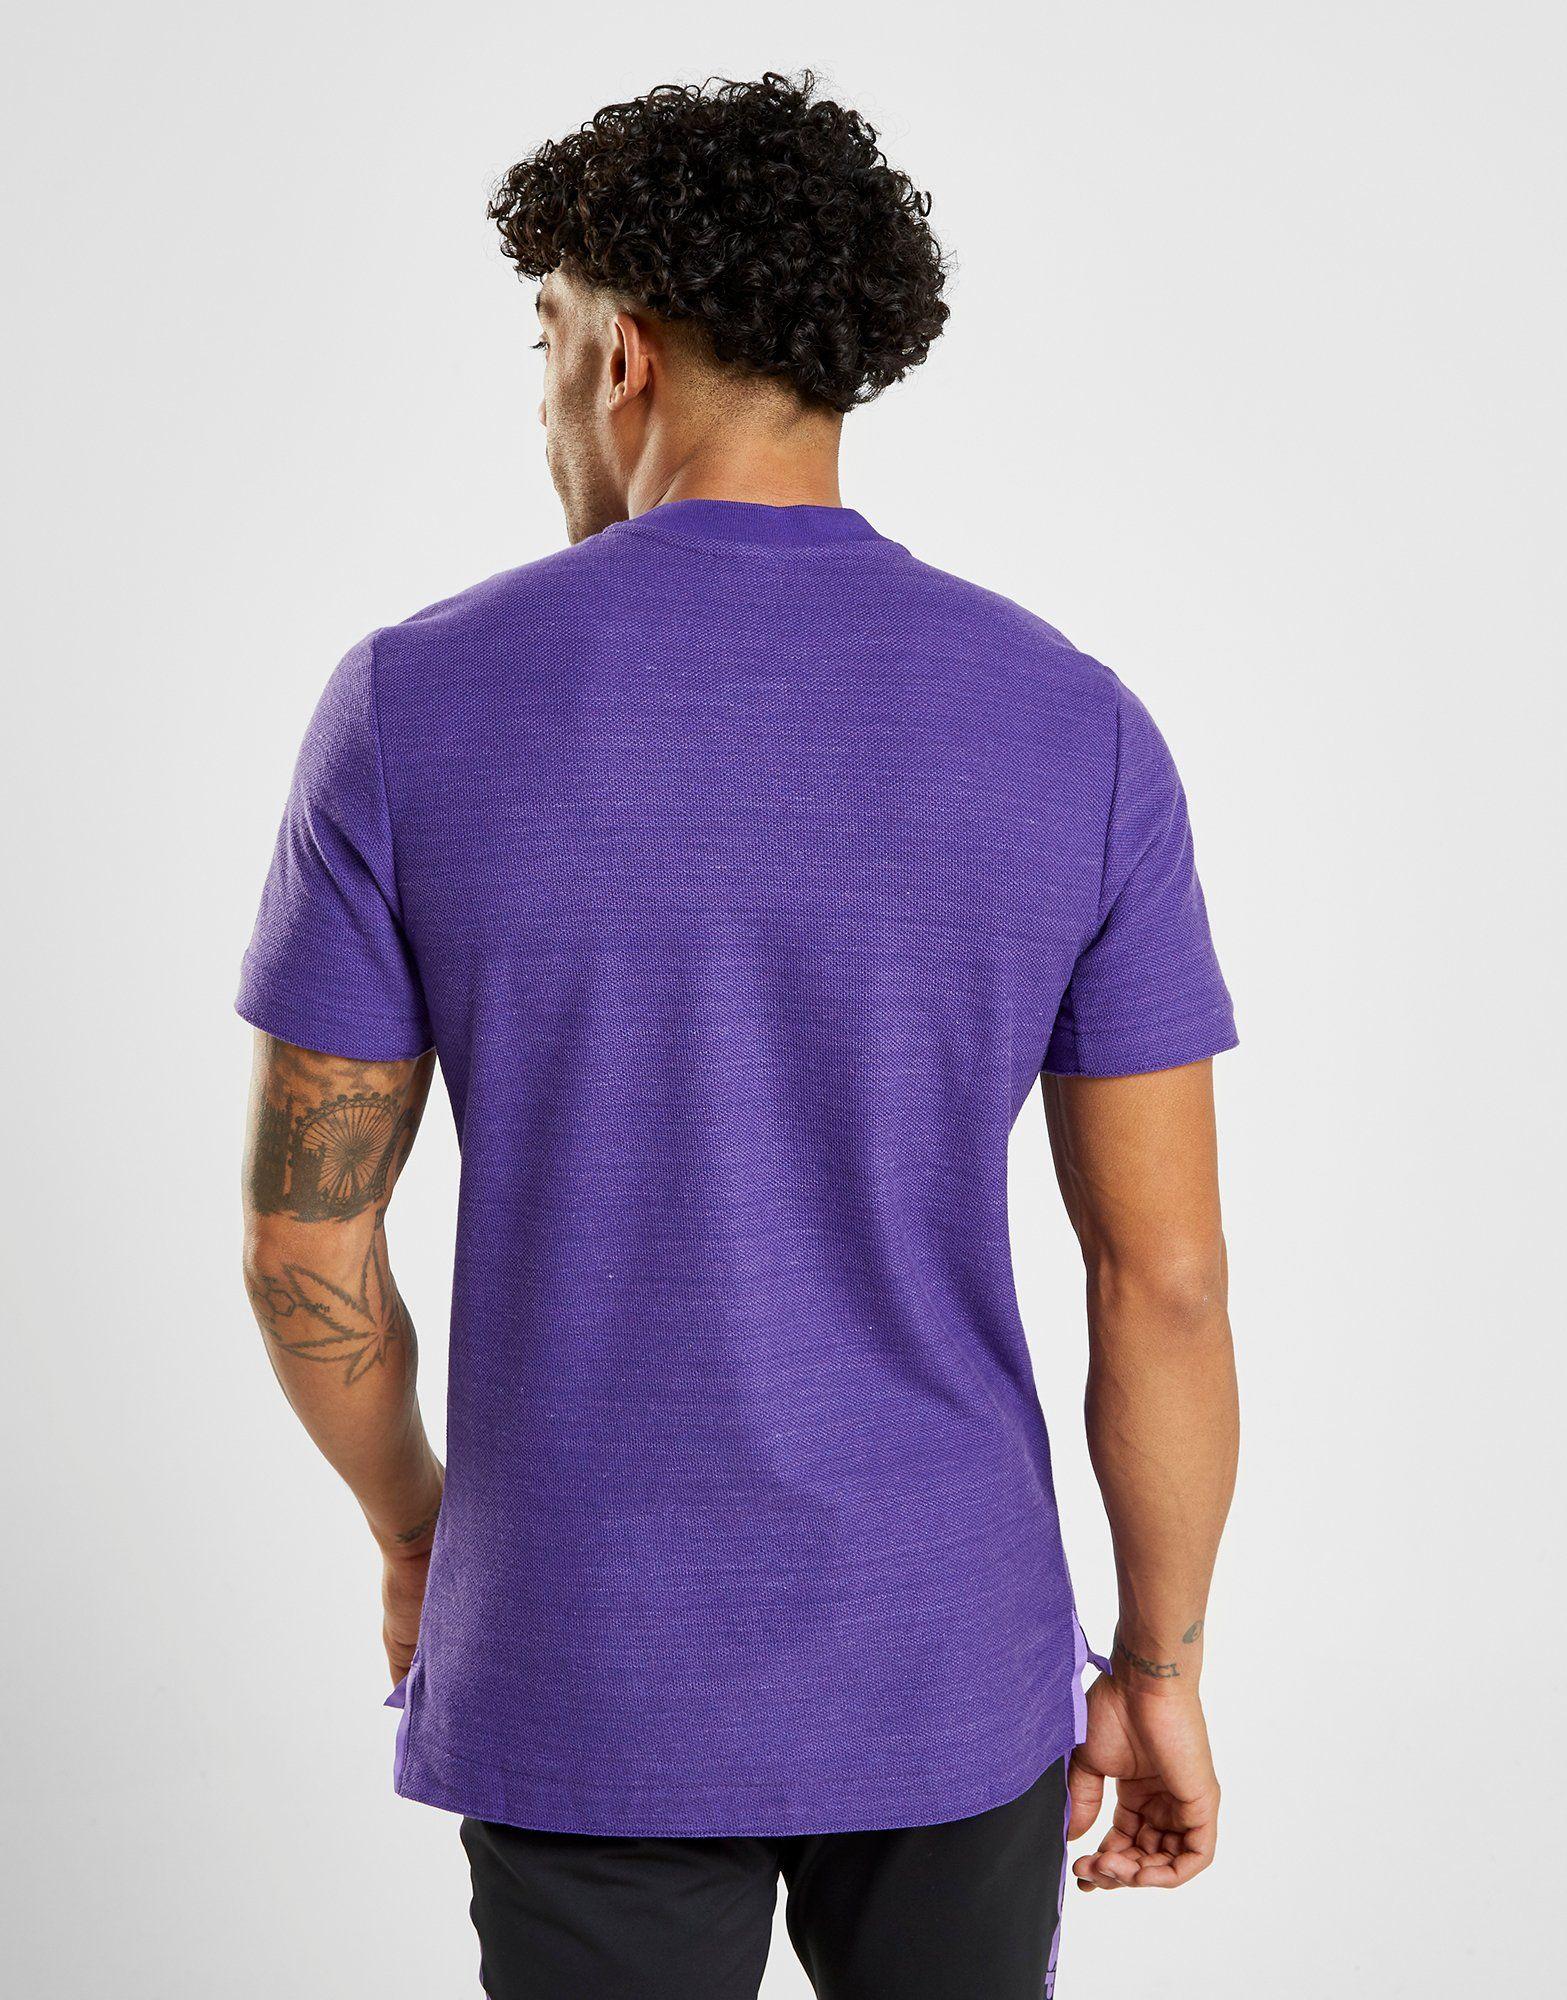 Nike Sportswear Tottenham Hotspur FC Pique Polo Shirt